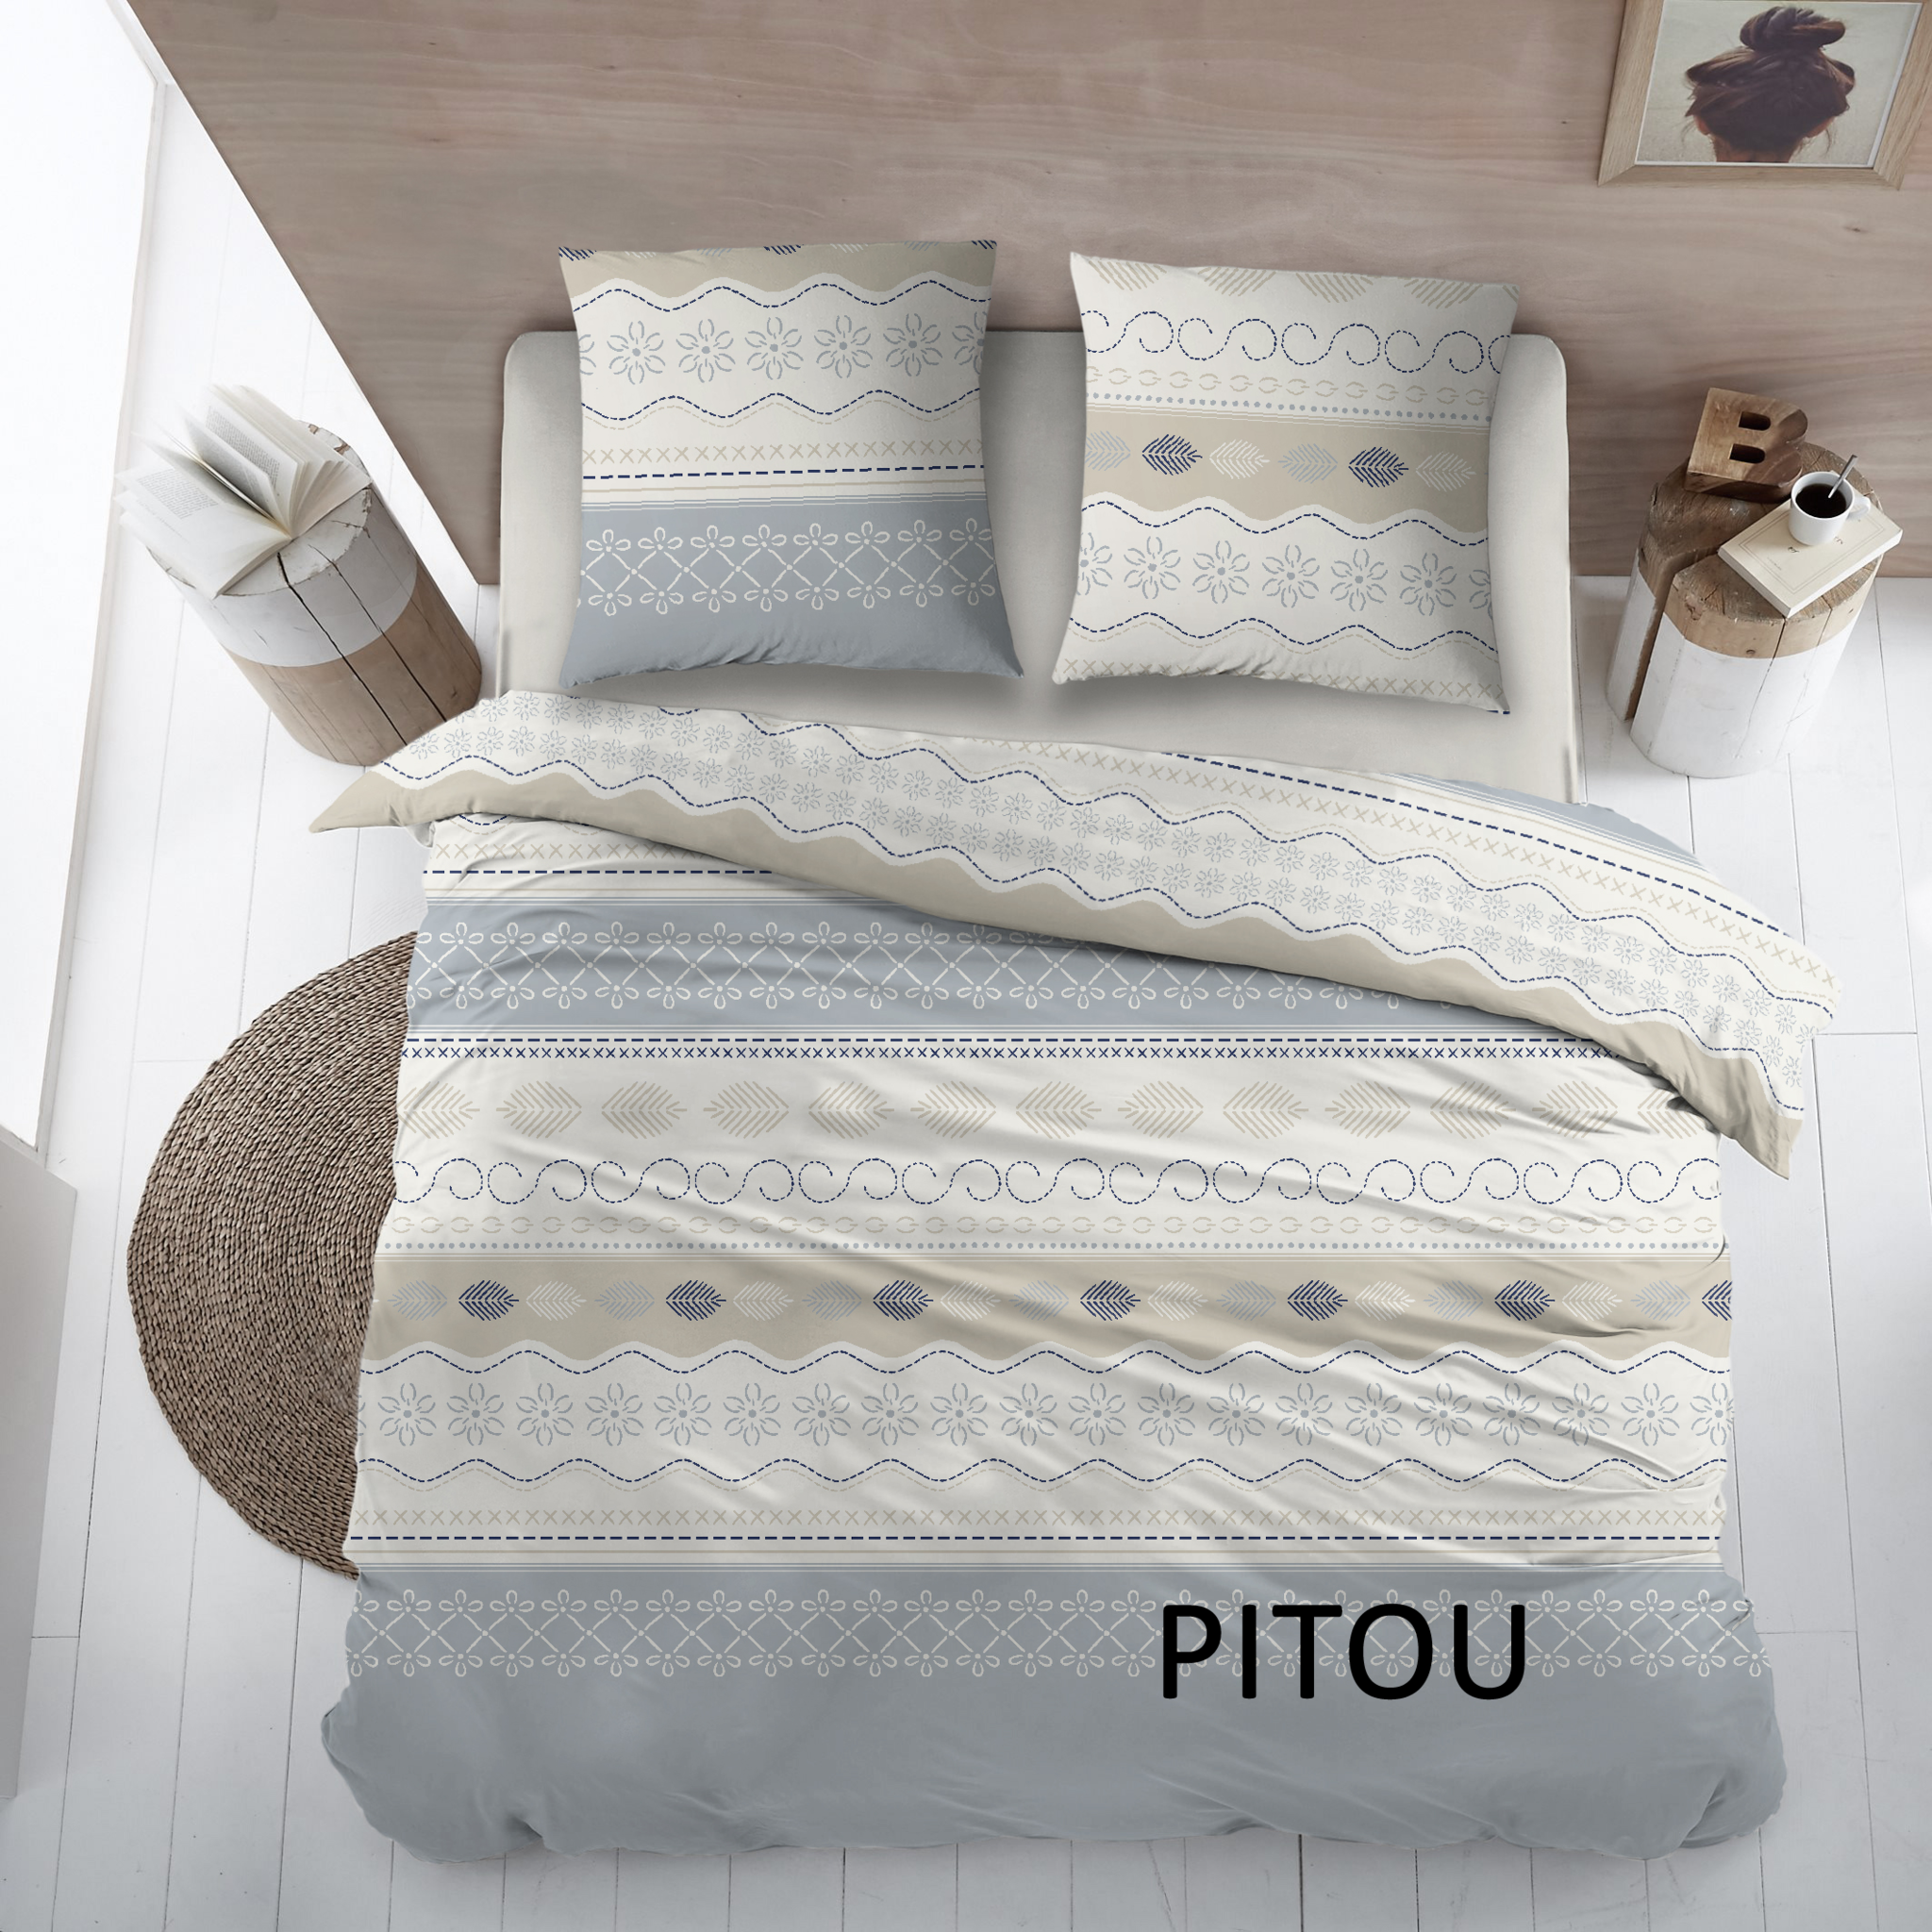 Cottons Dekbedovertrek Katoen Pitou Blue